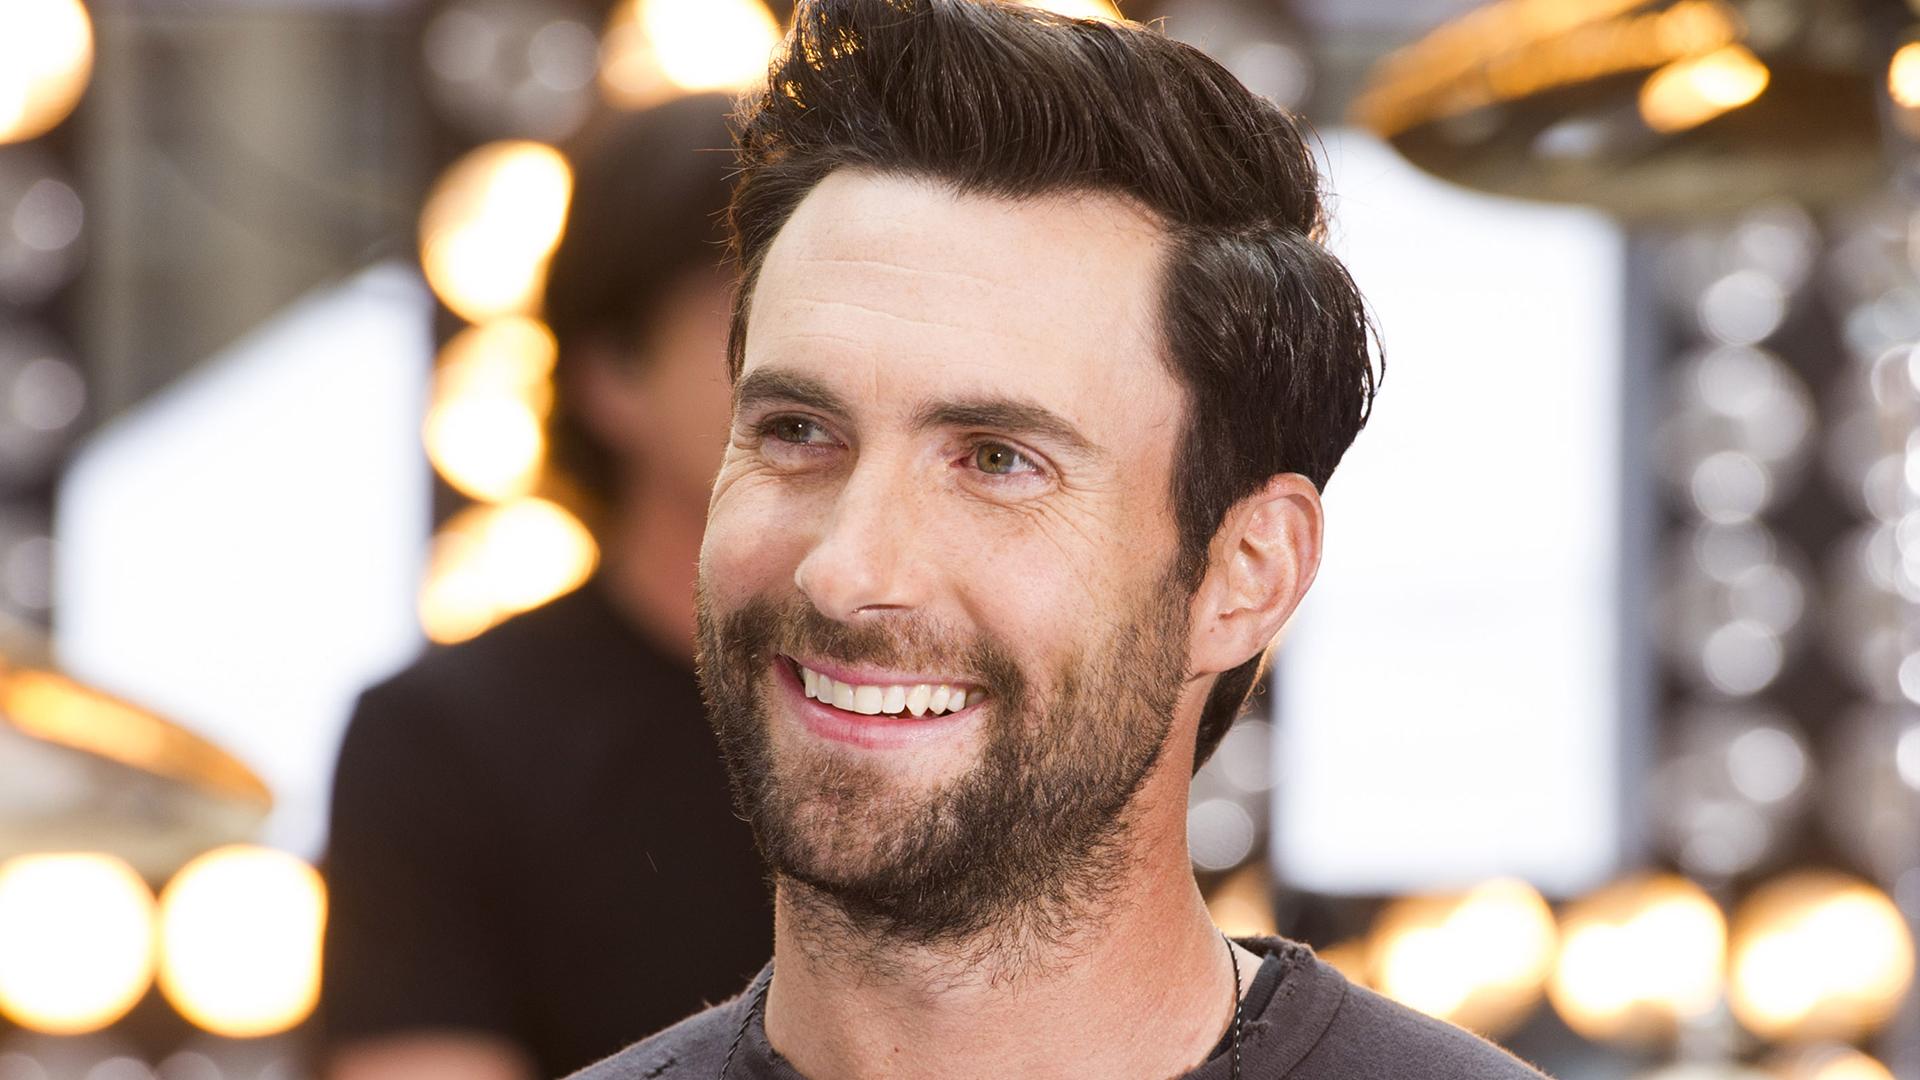 Adam Levine's Mohawk Hair Is His Wildest Style Yet